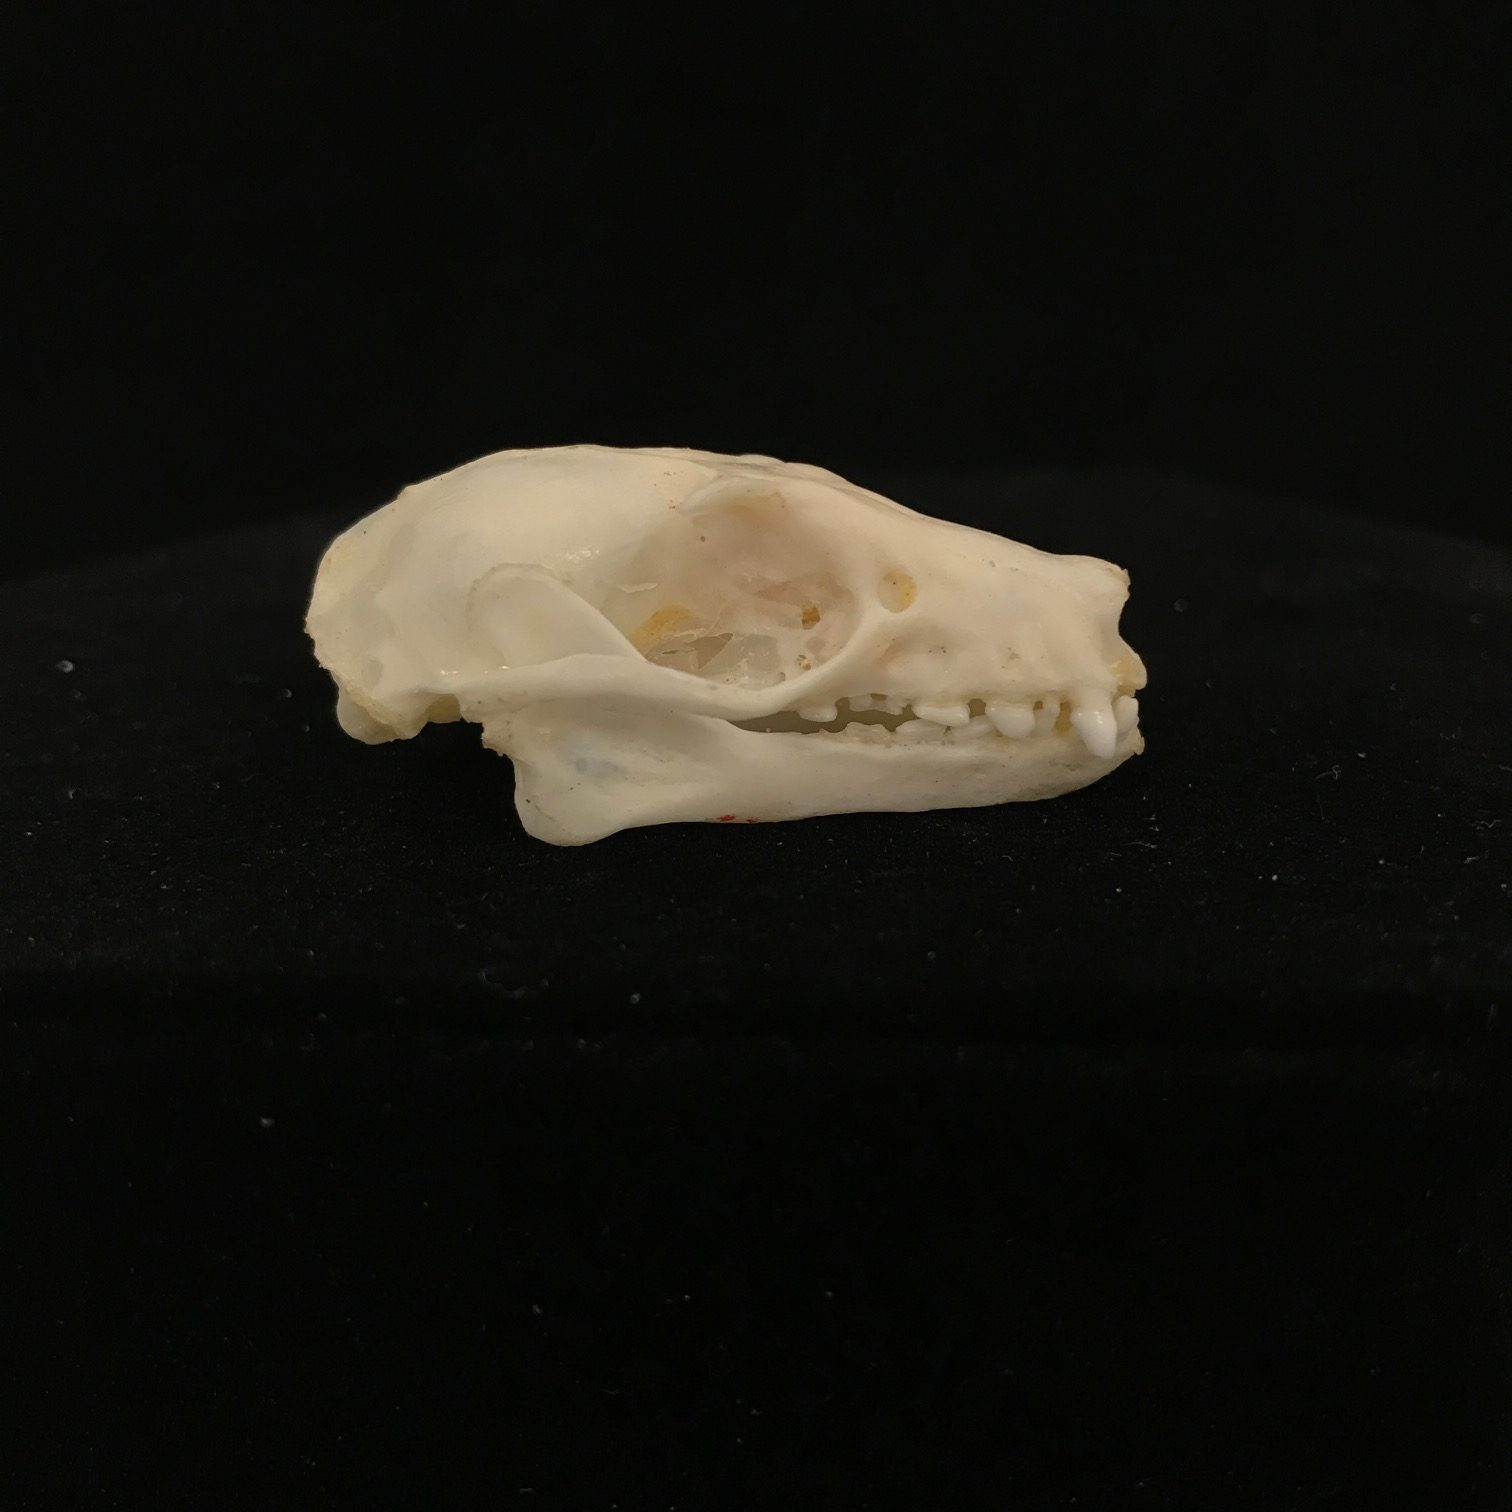 Rousettus leschenaulti bat skull Taxidermy REAL